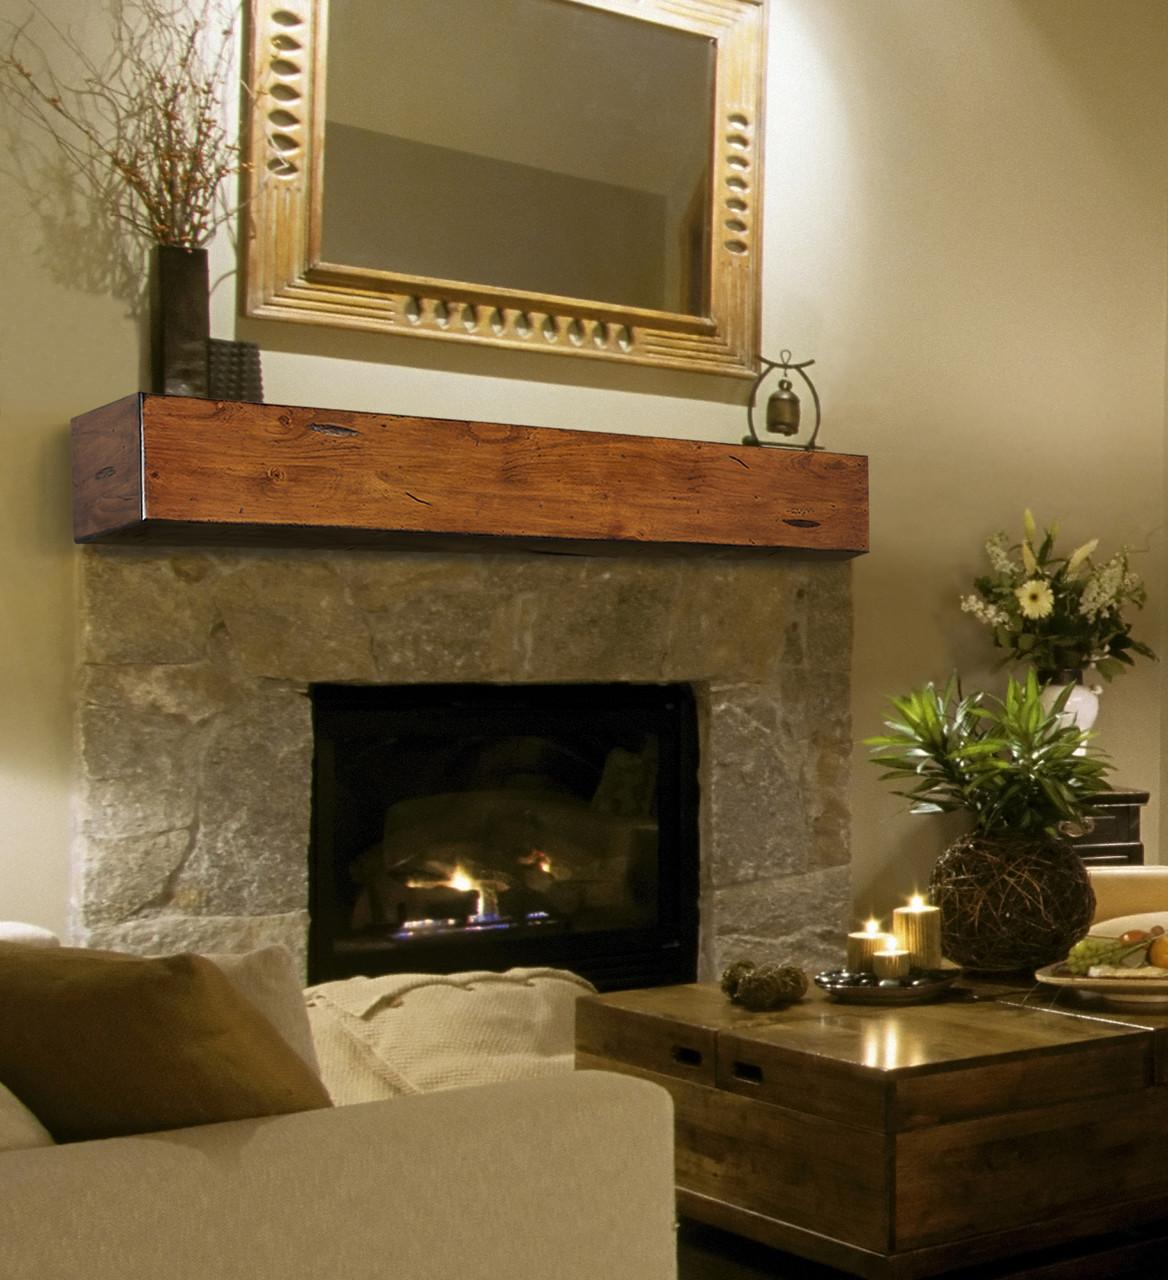 The Lexington 496 Fireplace Mantel Shelf, Life Style View 3